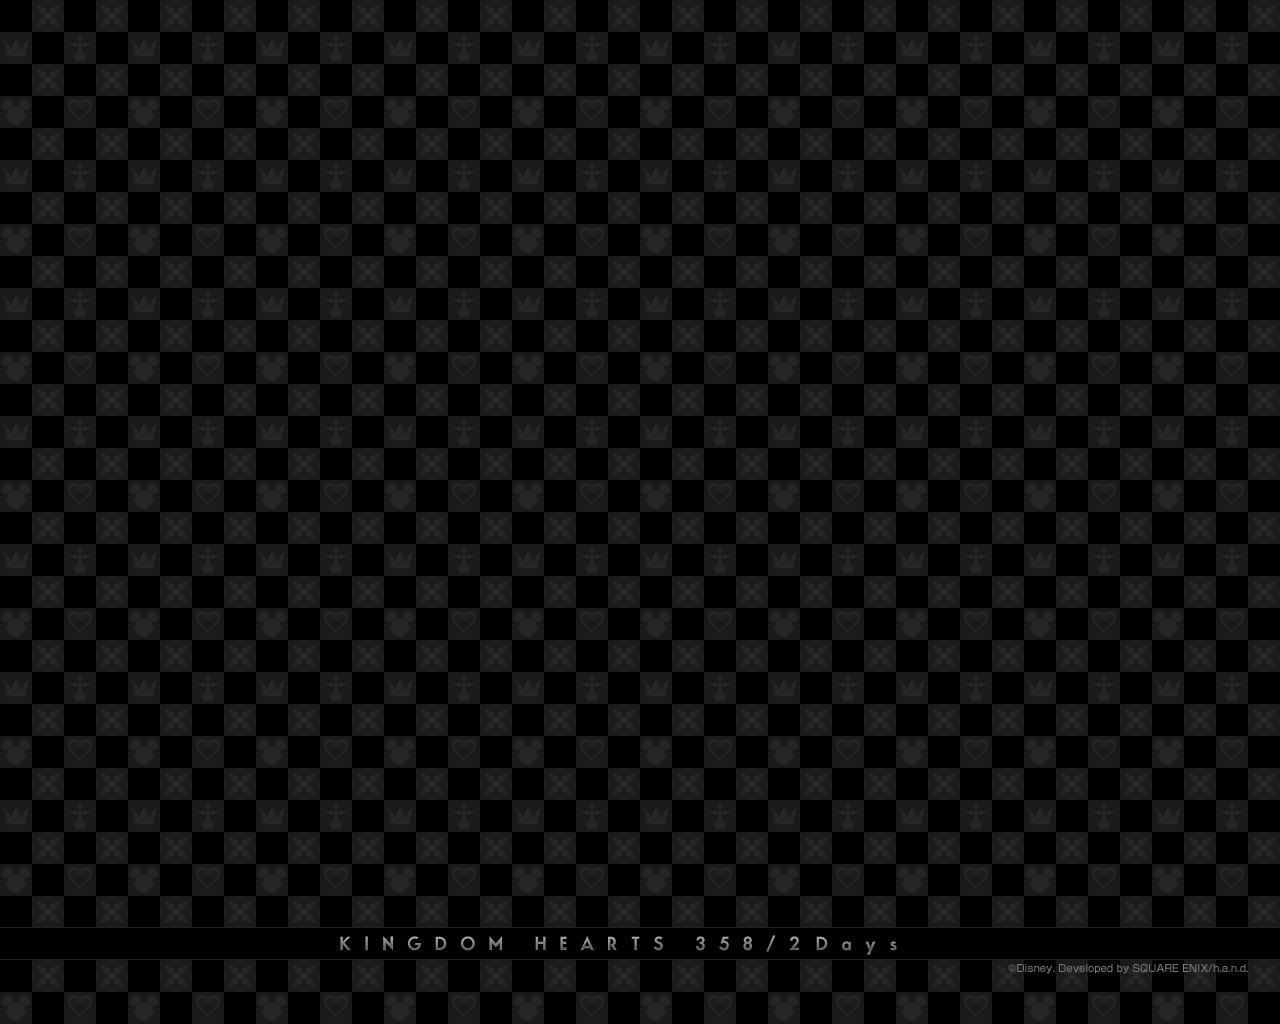 Kingdom Hearts 358/2 background